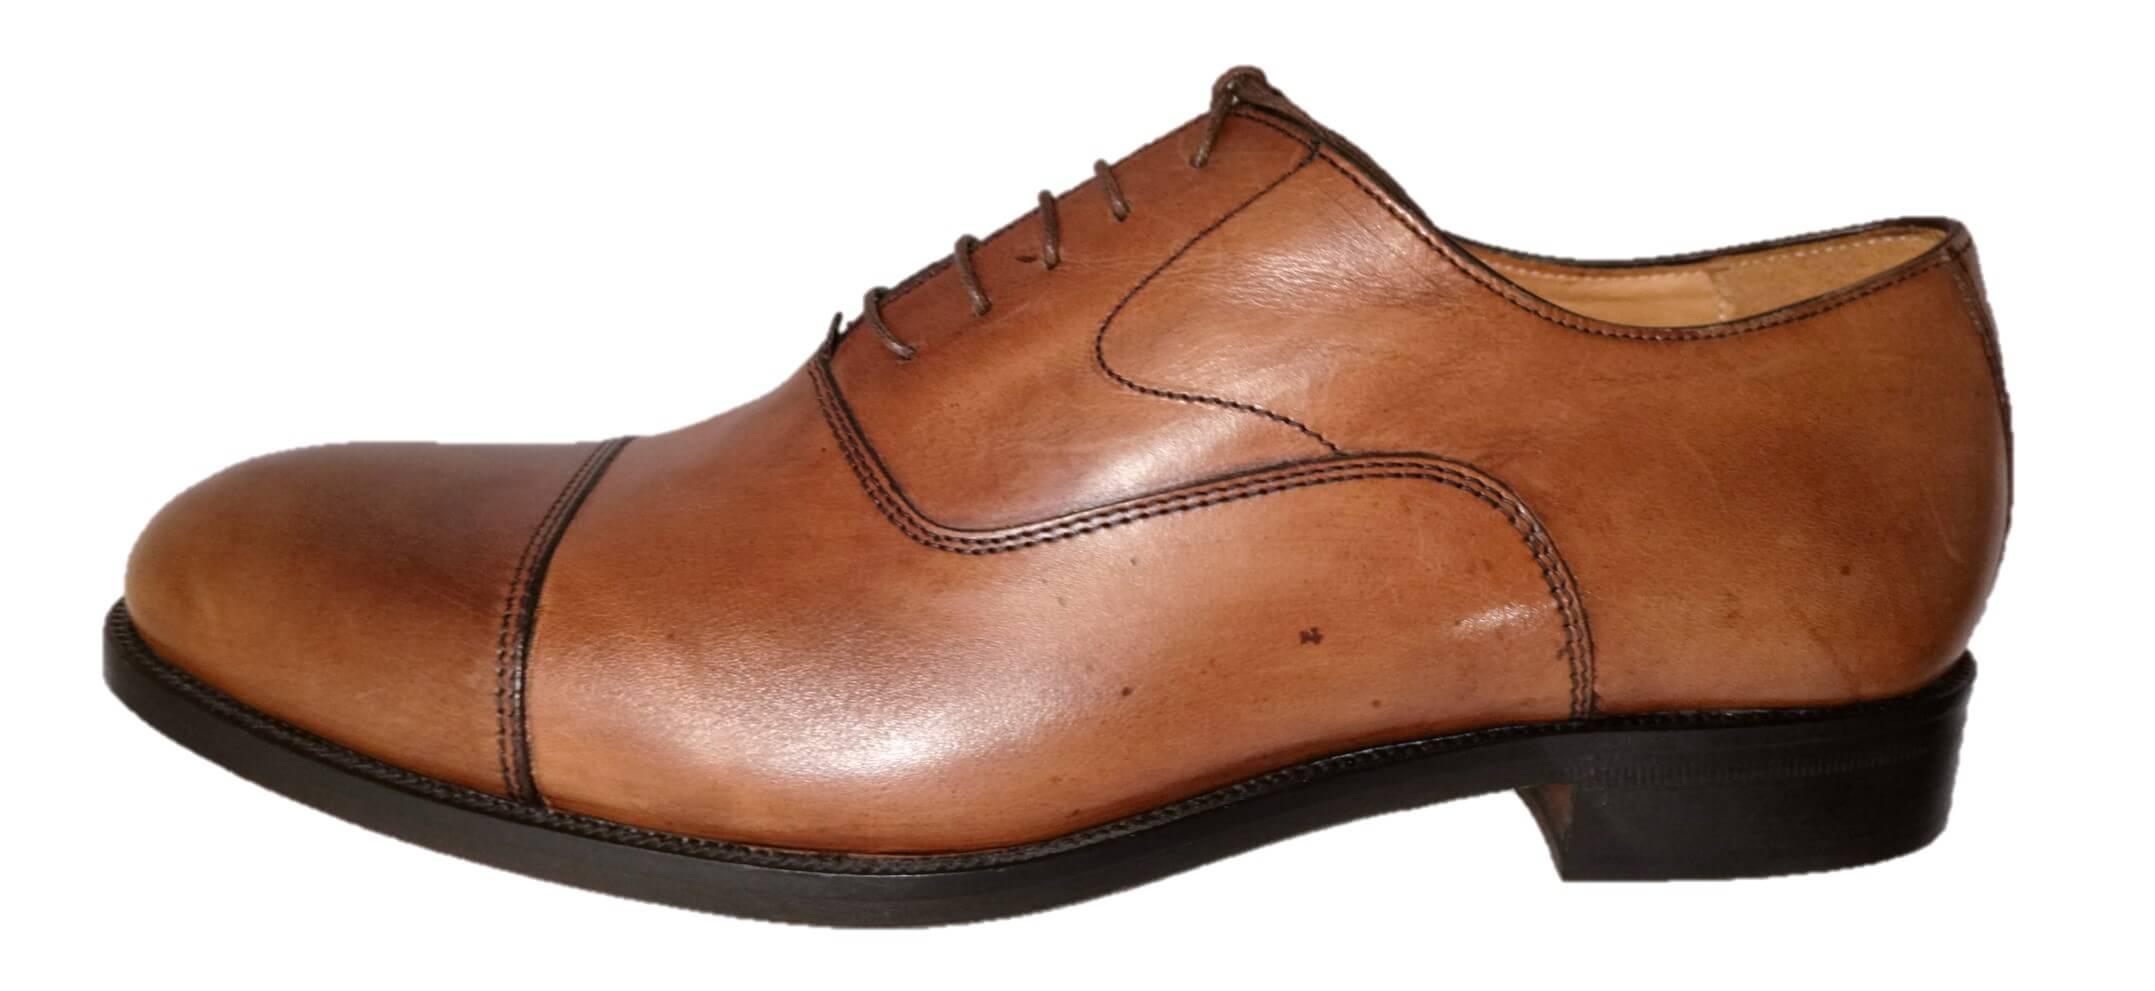 tan leather cap toe